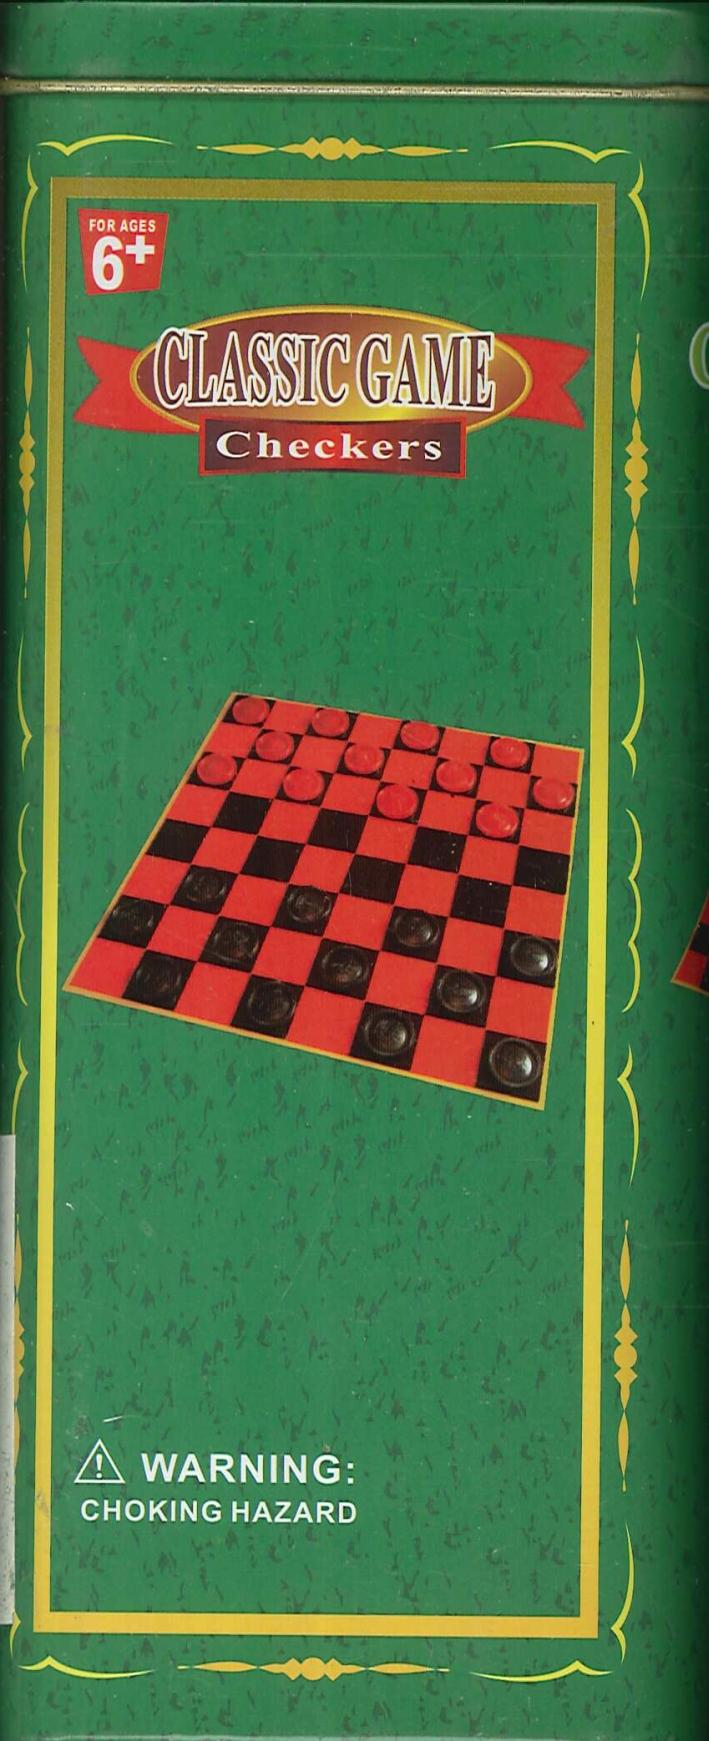 Classic Game. Checkers. Dama.